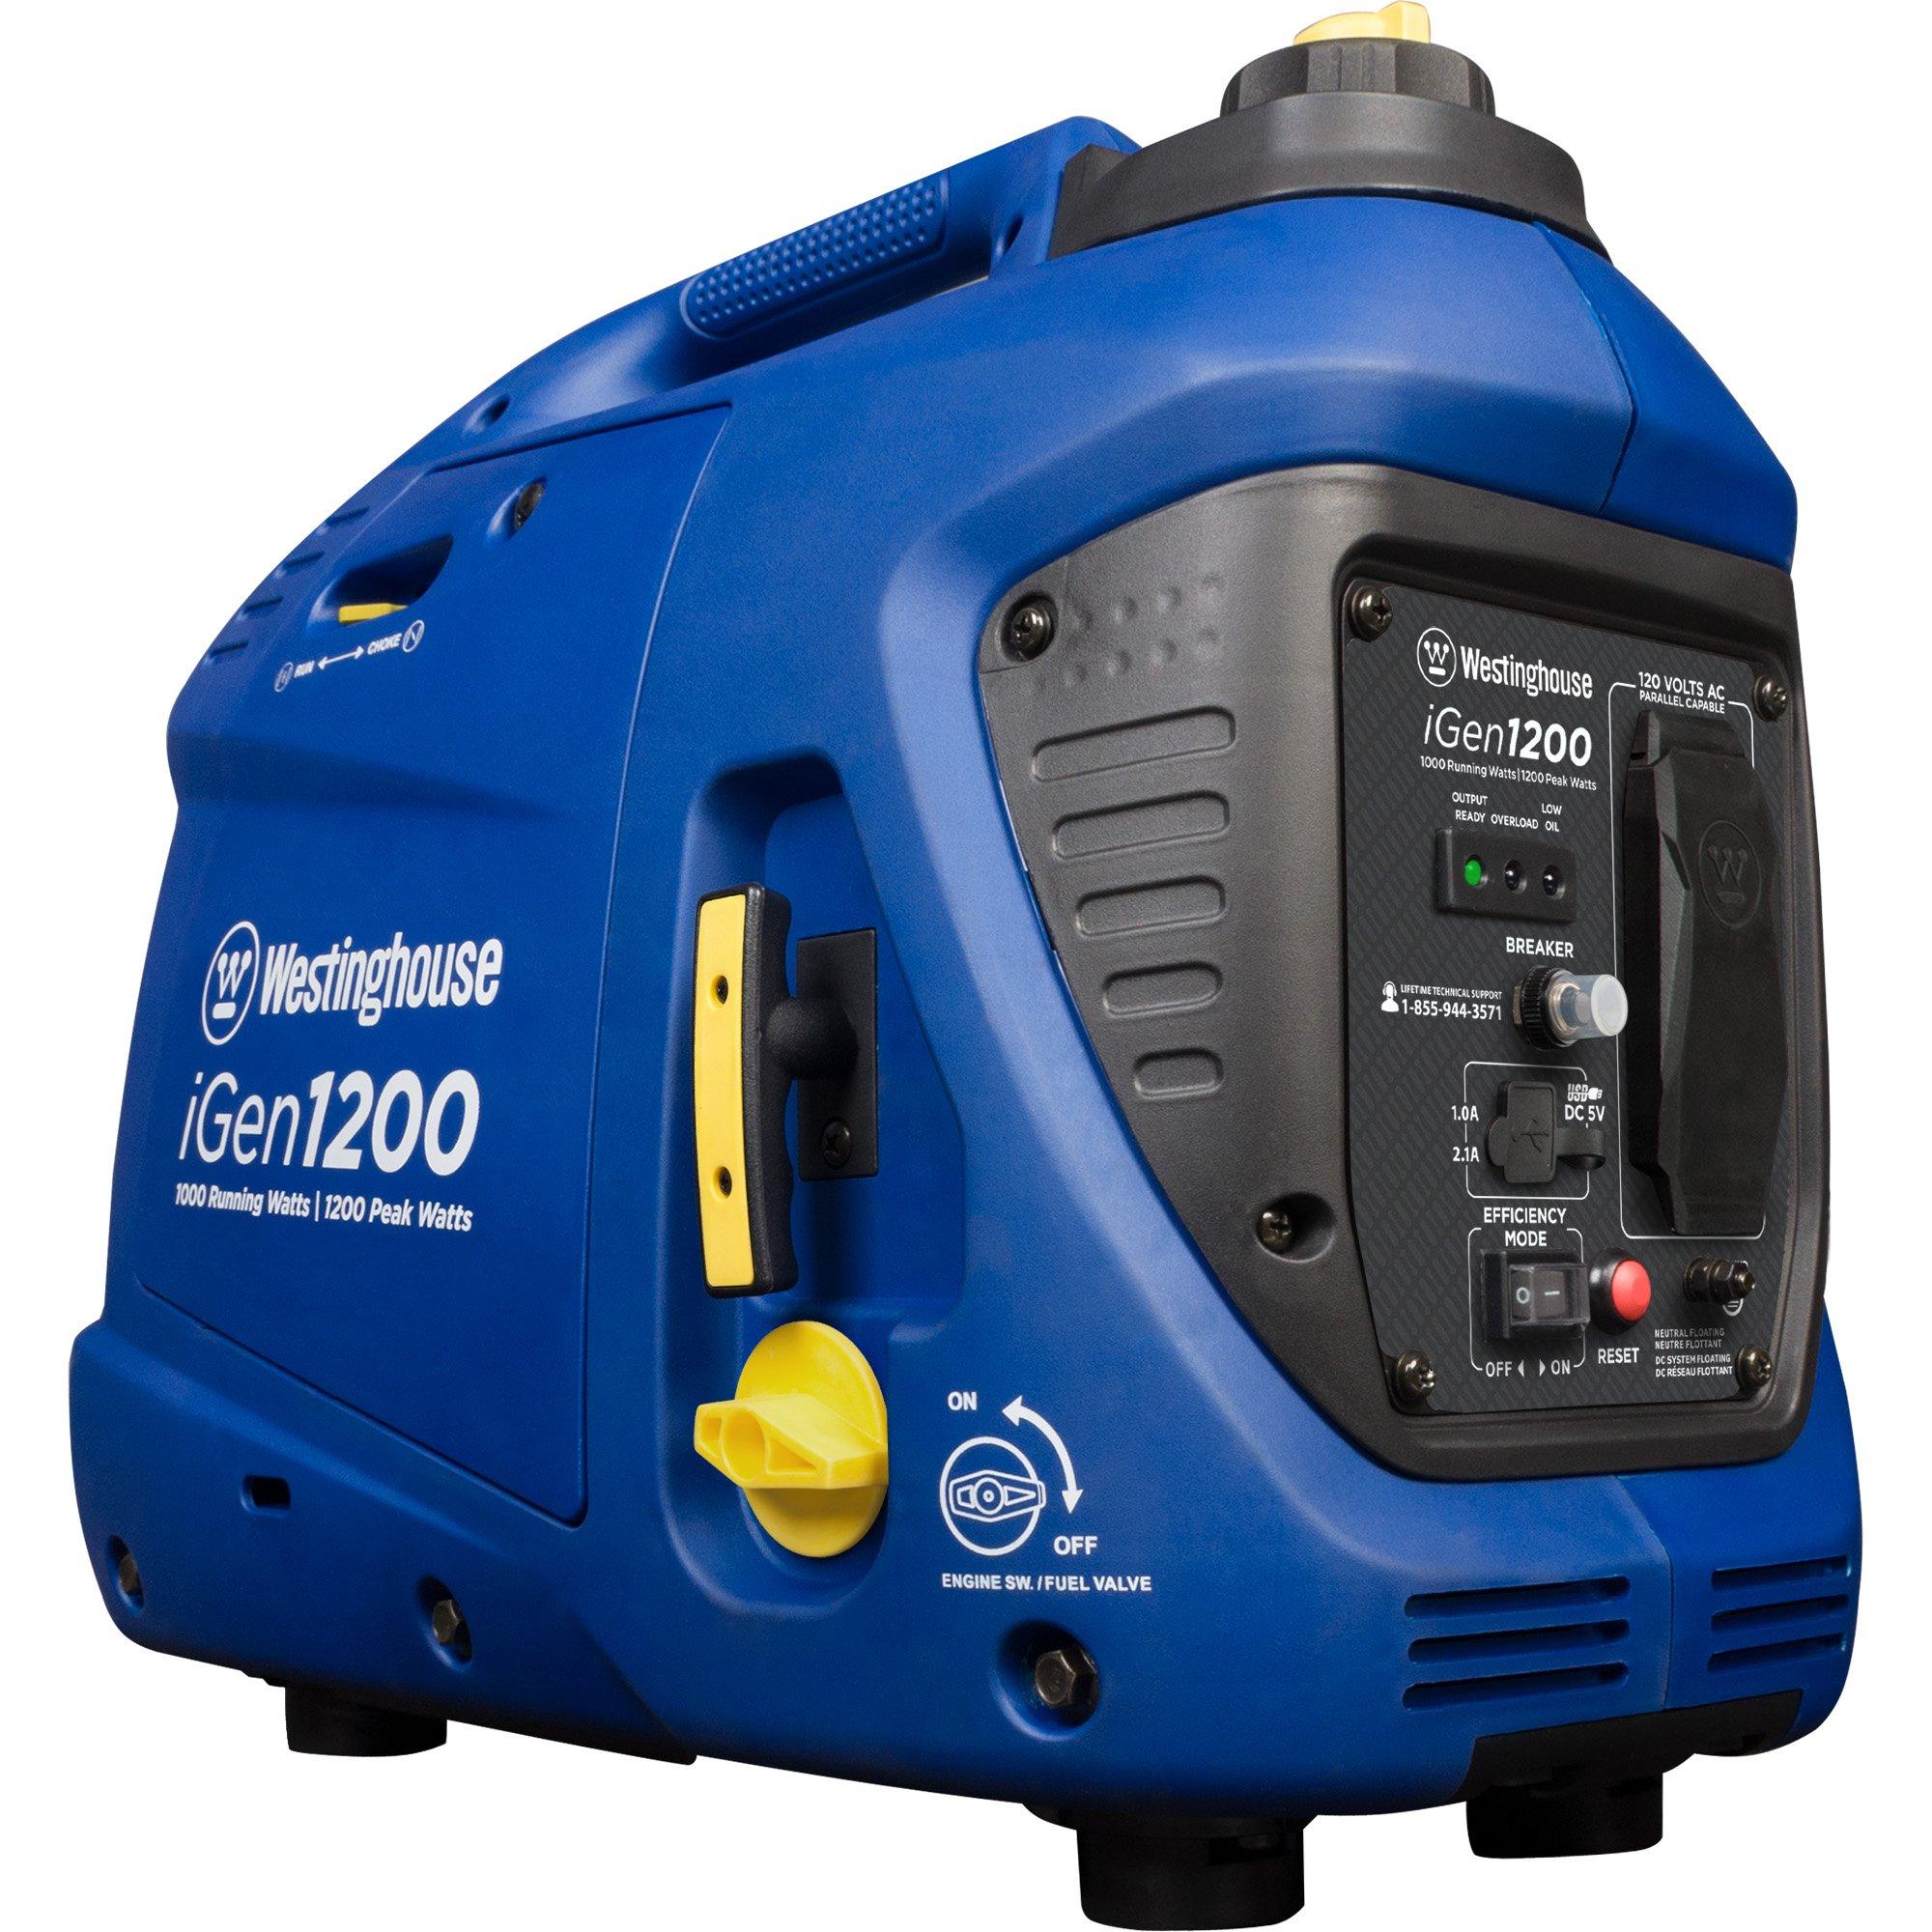 Westinghouse iGen1200 Portable Inverter Generator - 1000 Rated Watts & 1200 Peak Watts - Gas Powered